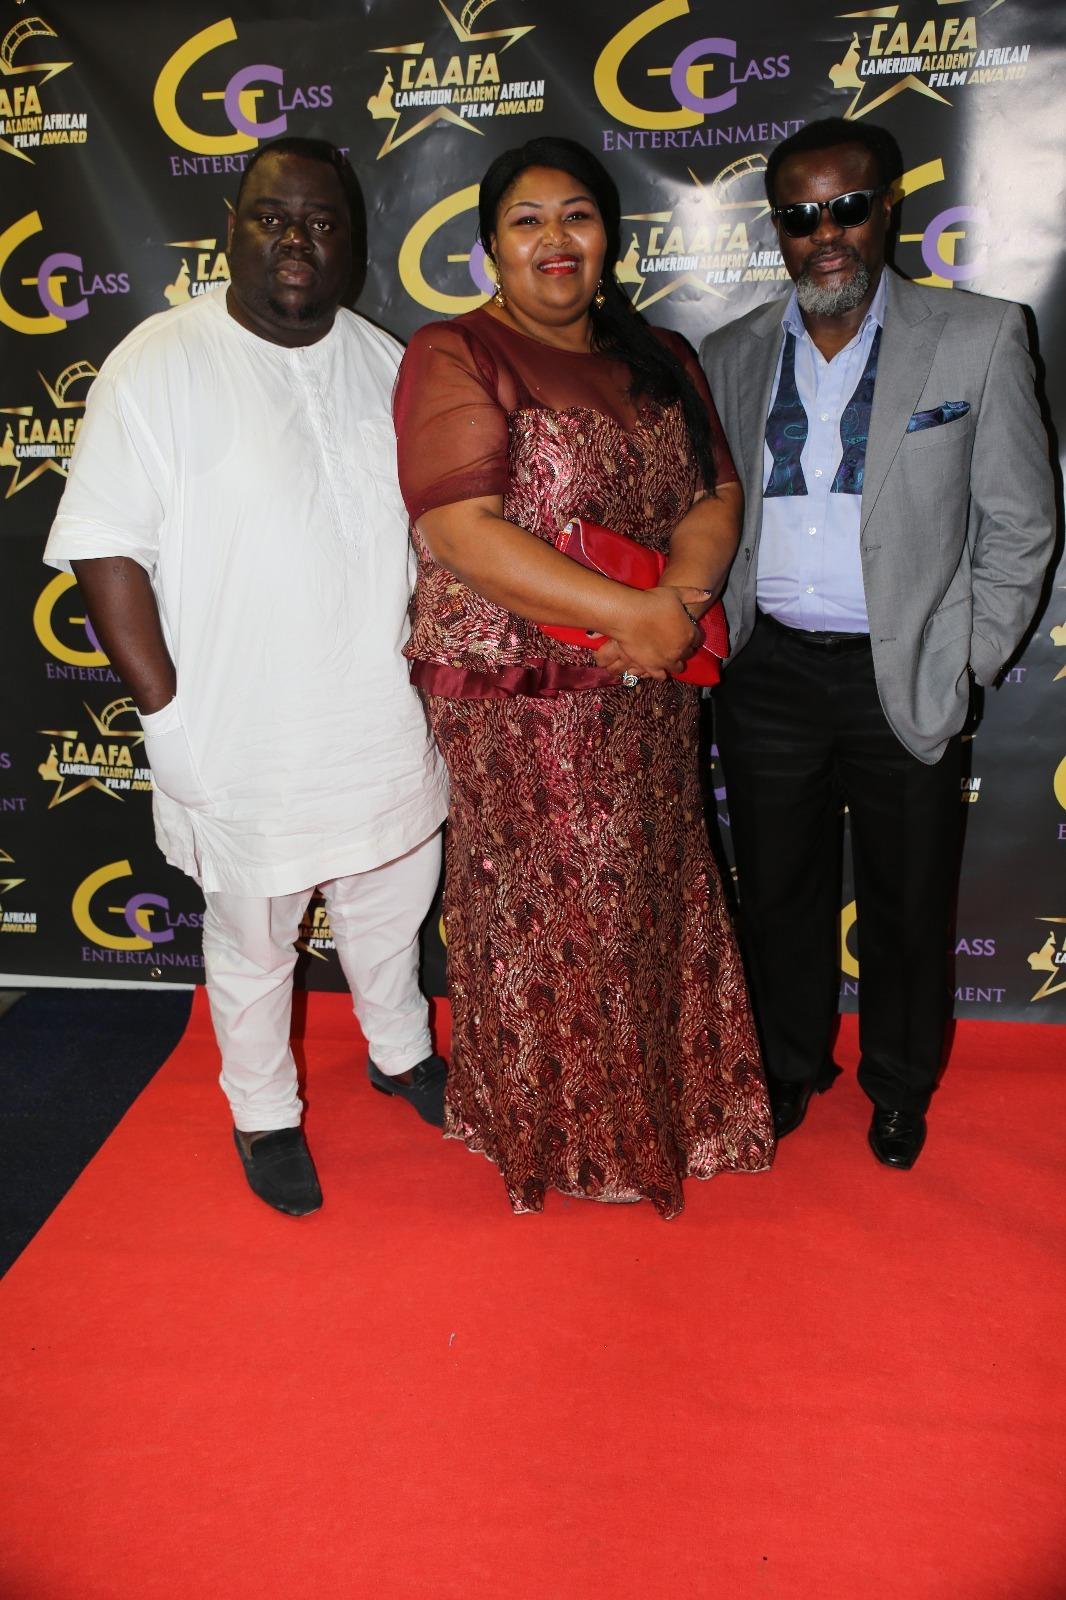 NOLLYWOOD STARS DOMINATES CAMEROON FILM AWARD